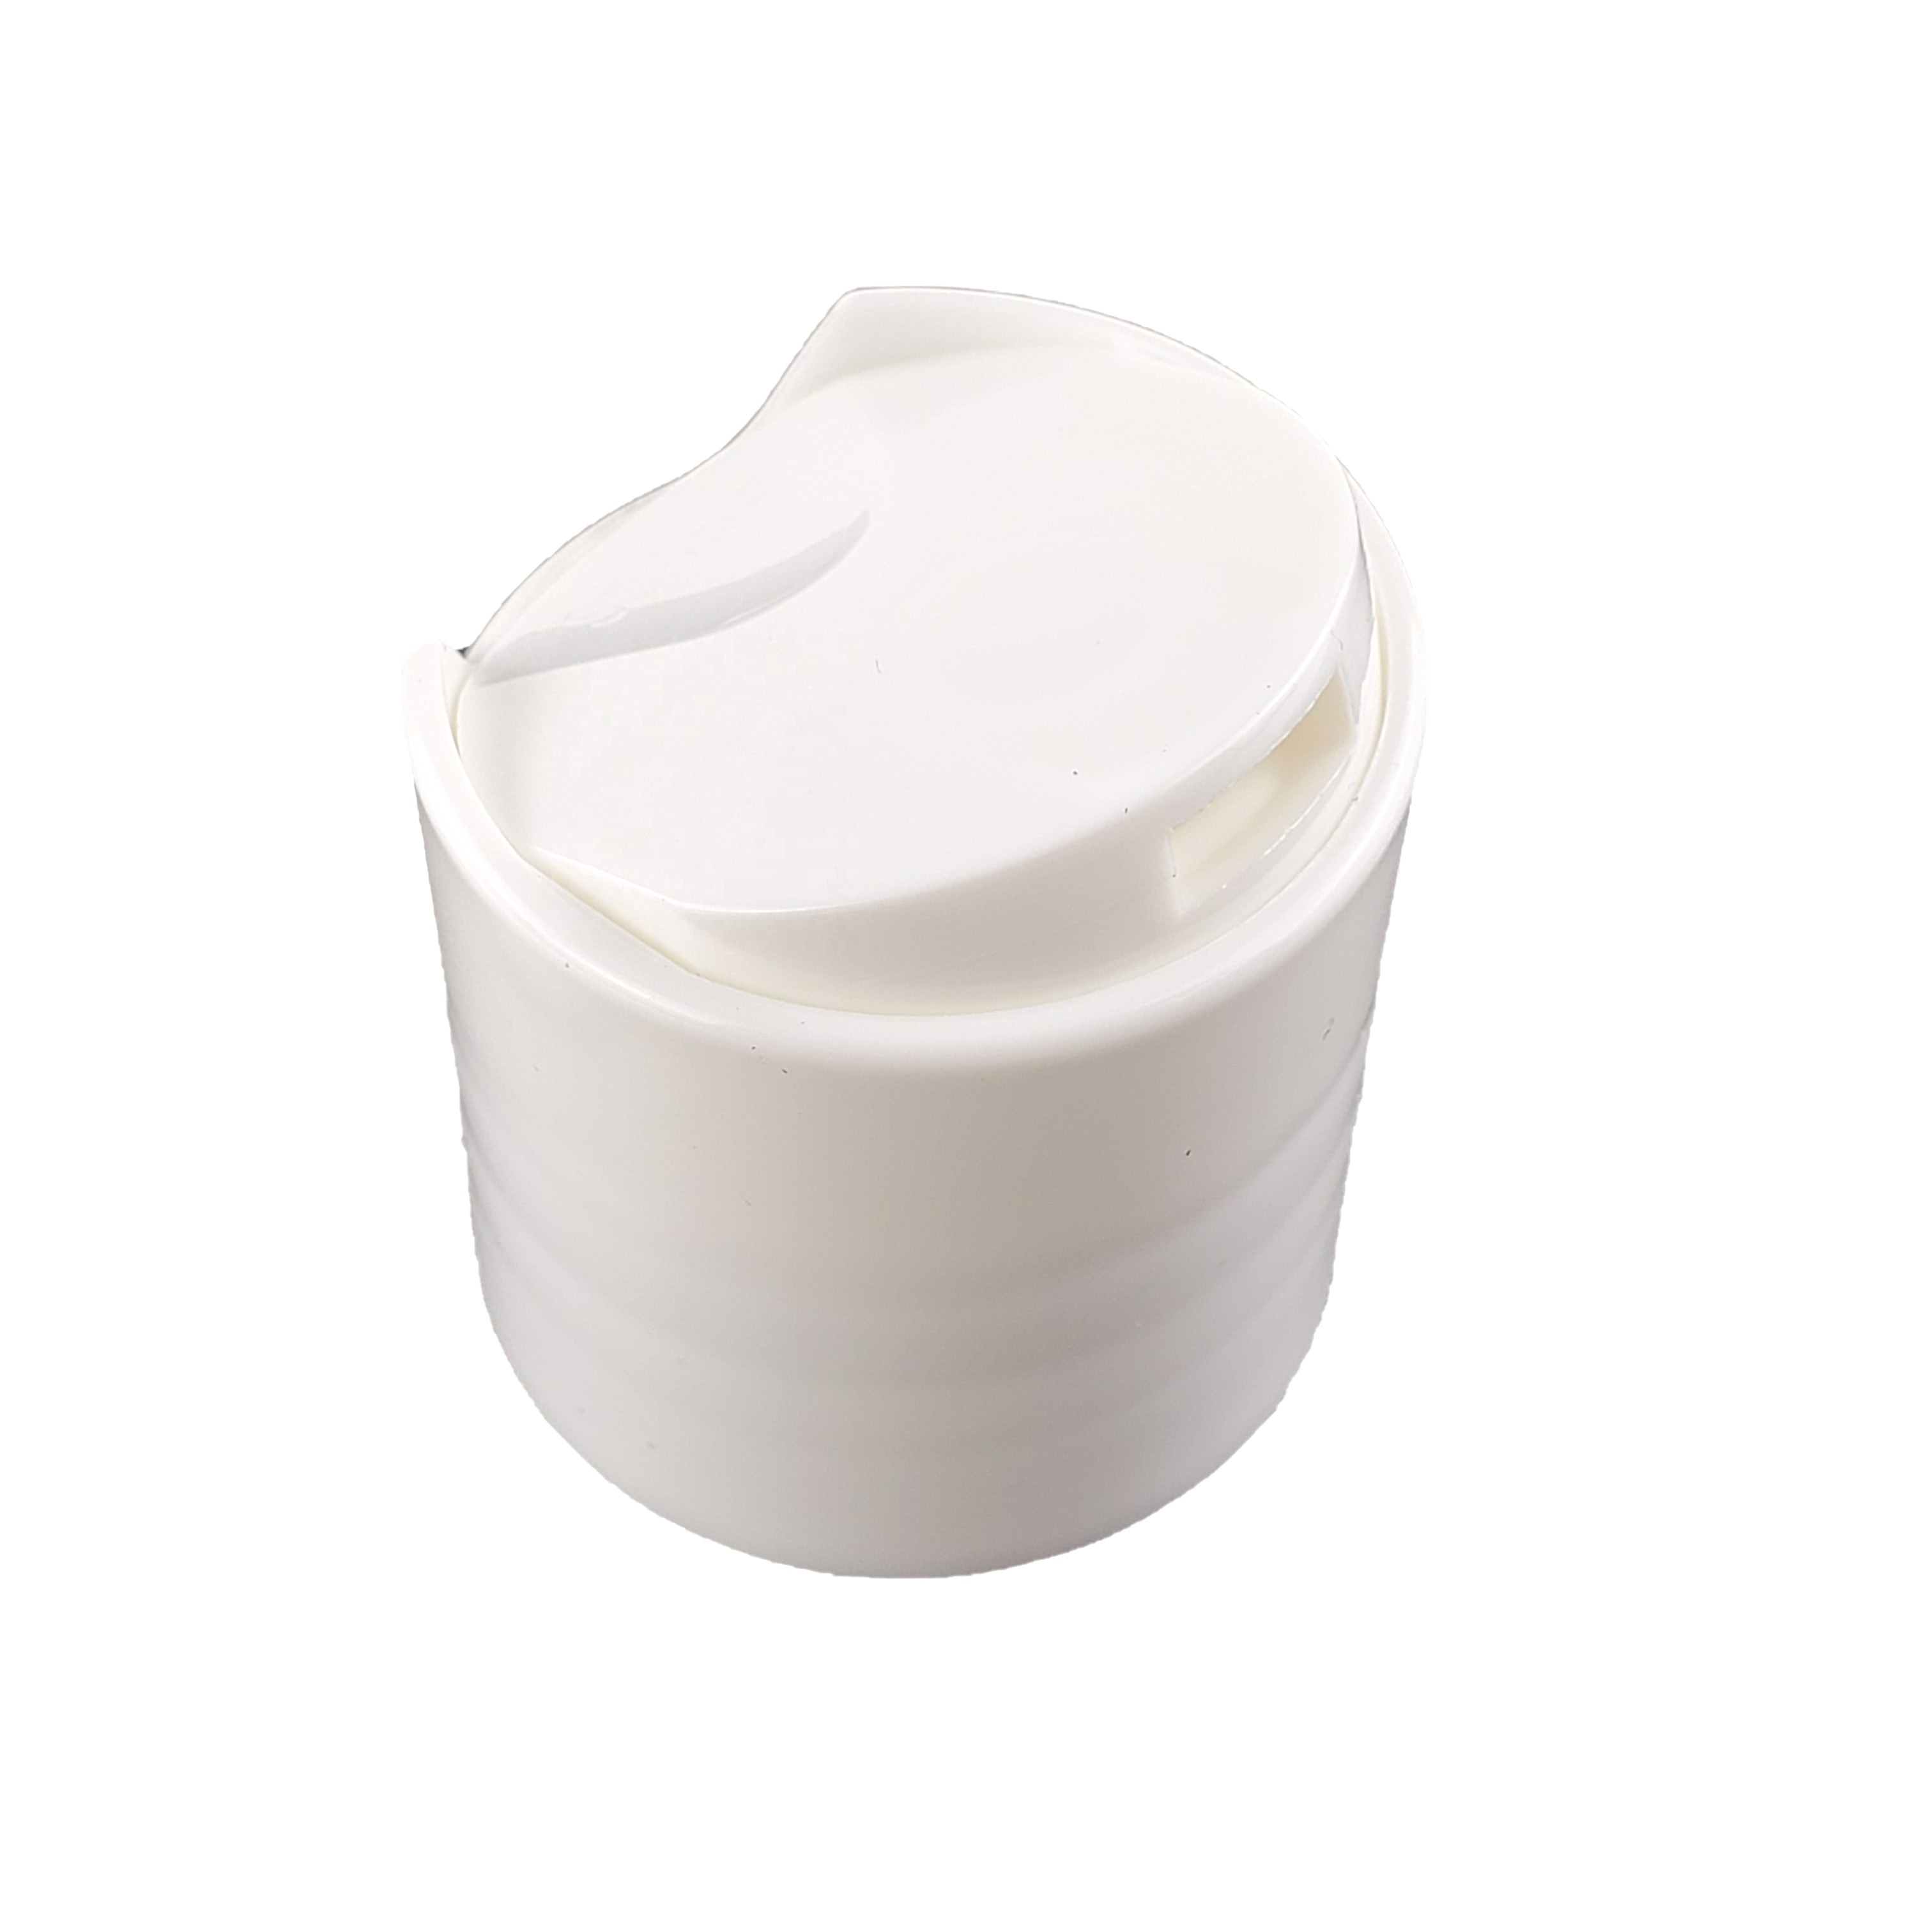 20 24 410 Dispensing plastic white disc top lid cap